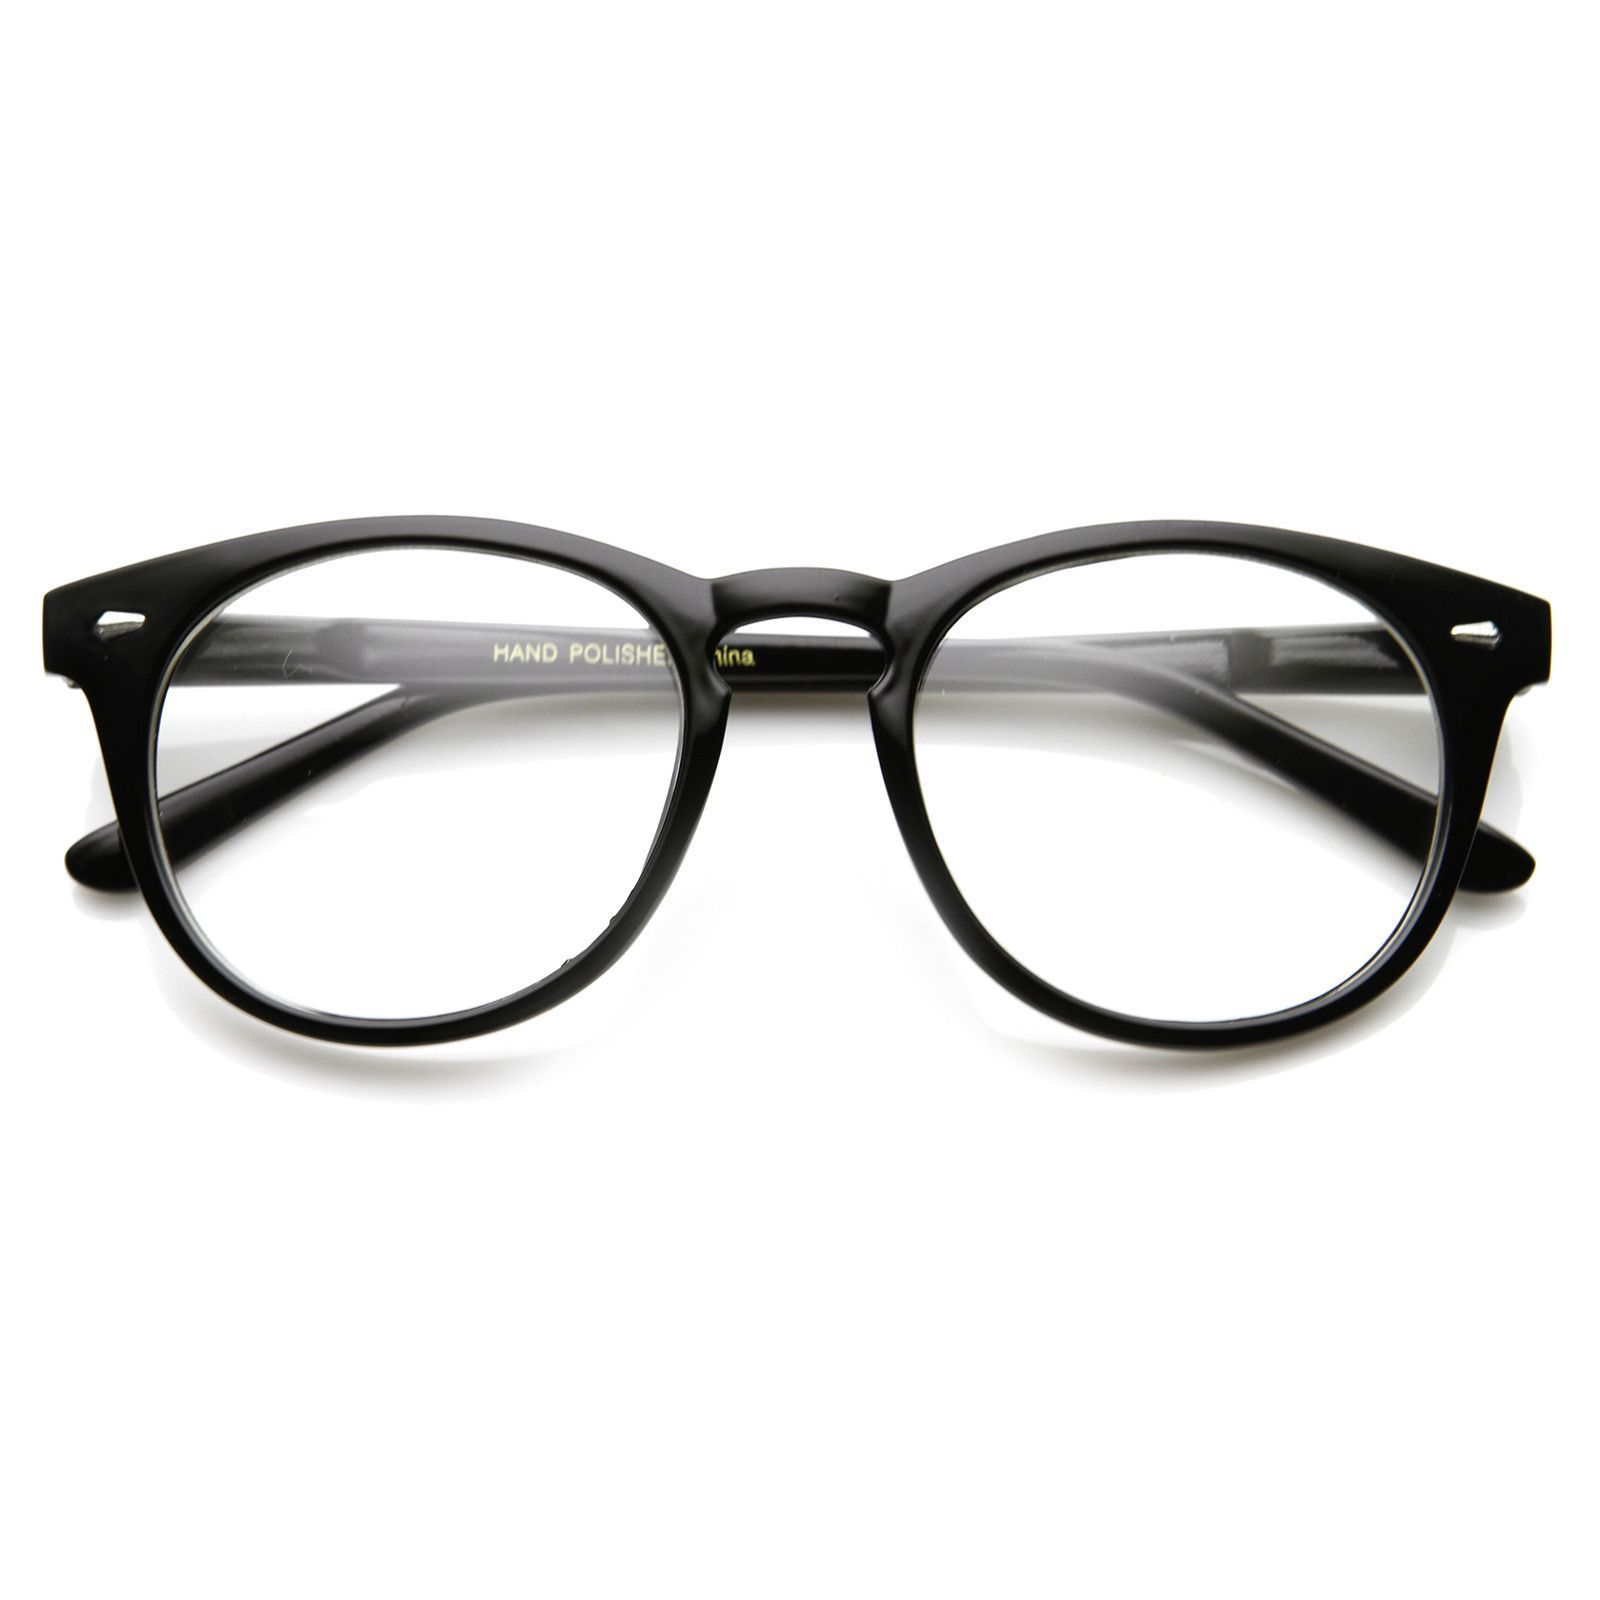 Classic vintage era round p3 clear lens optical glasses 8712